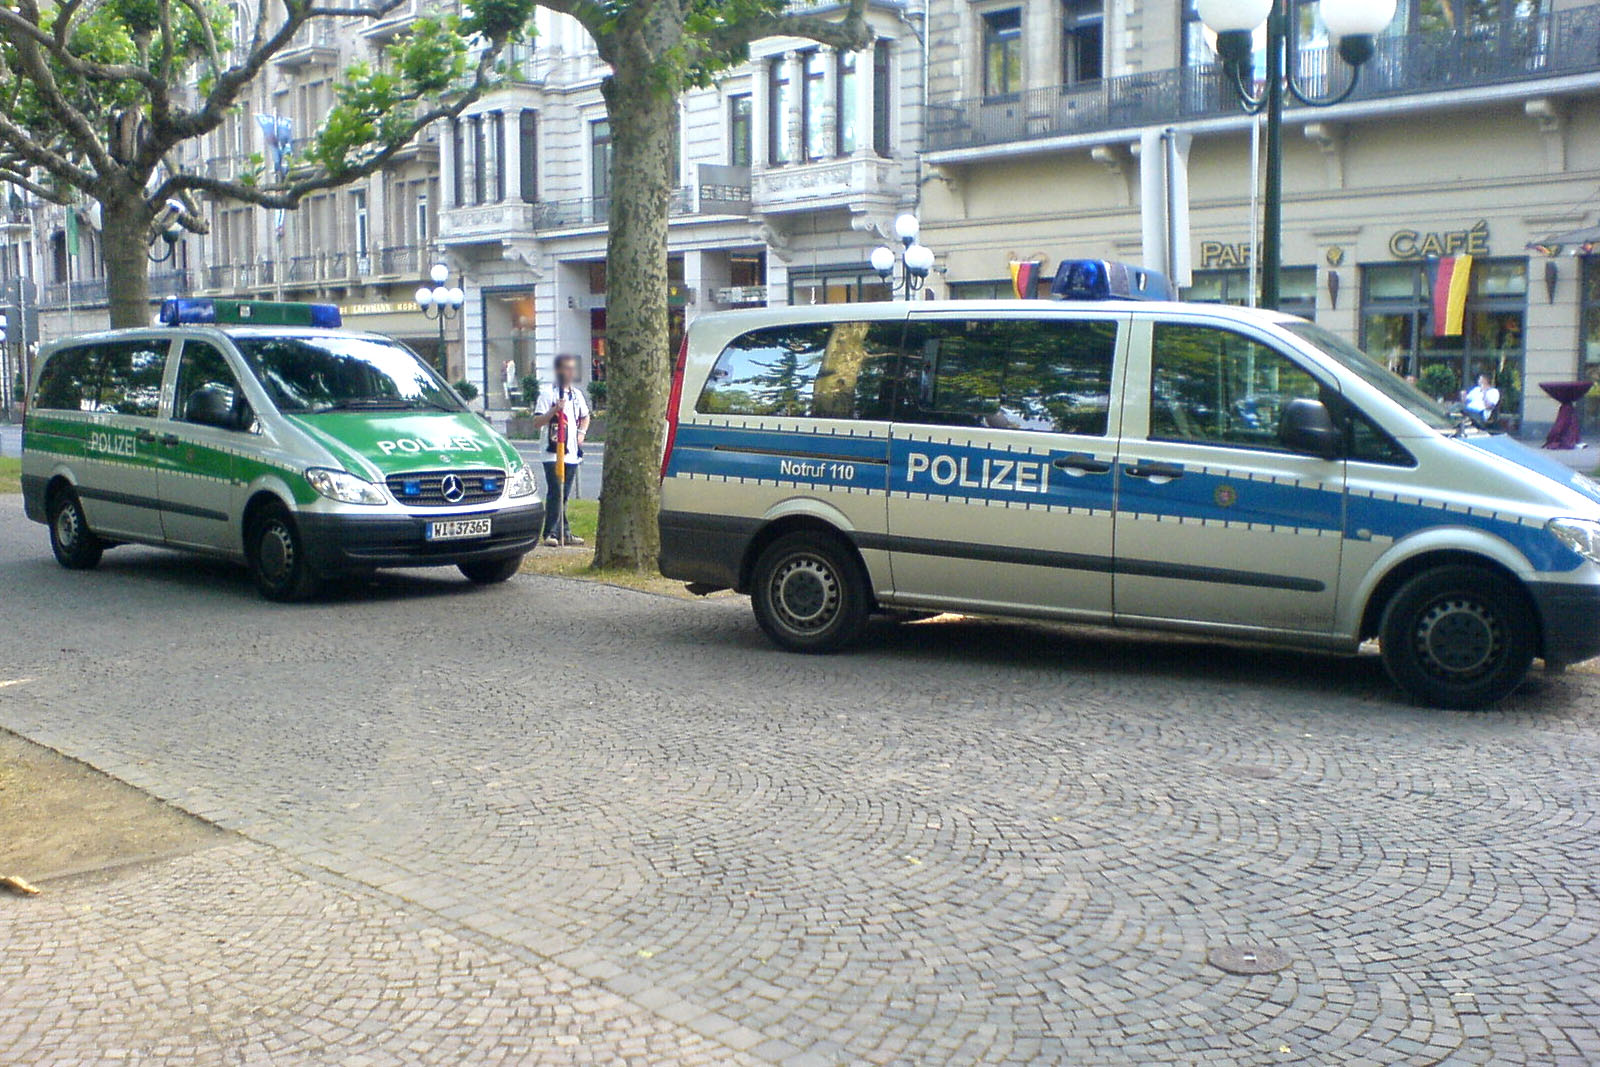 Polizei Grün Blau